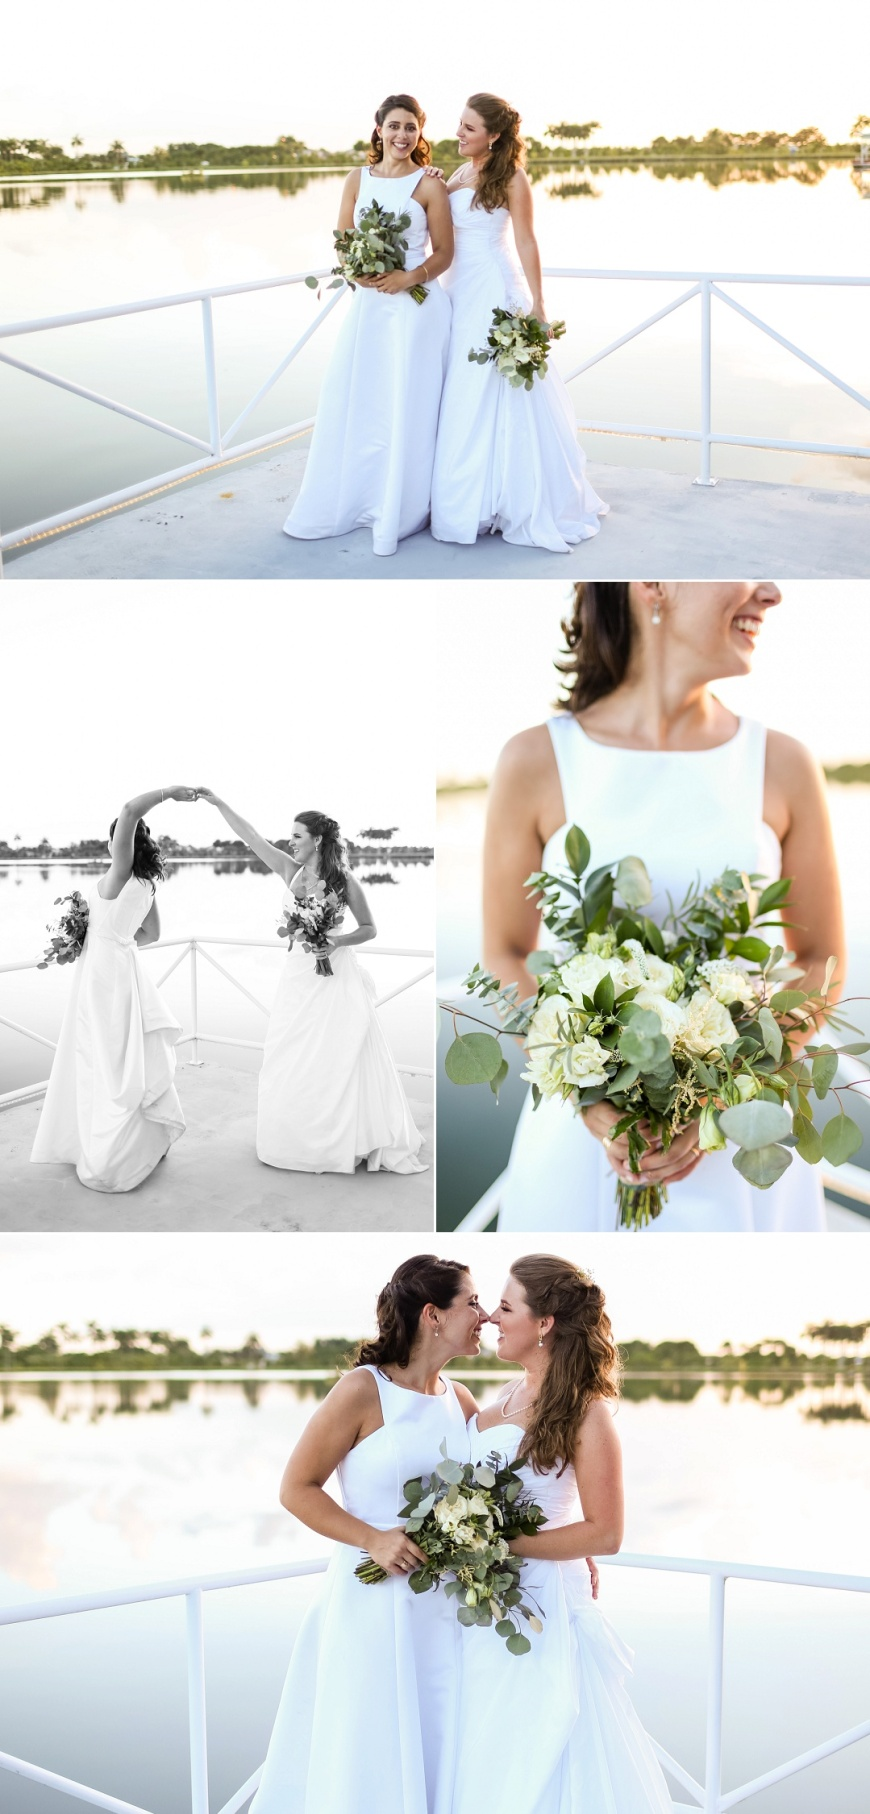 Royal-Palm-Island-Miami-Wedding-Photographer_1070.jpg